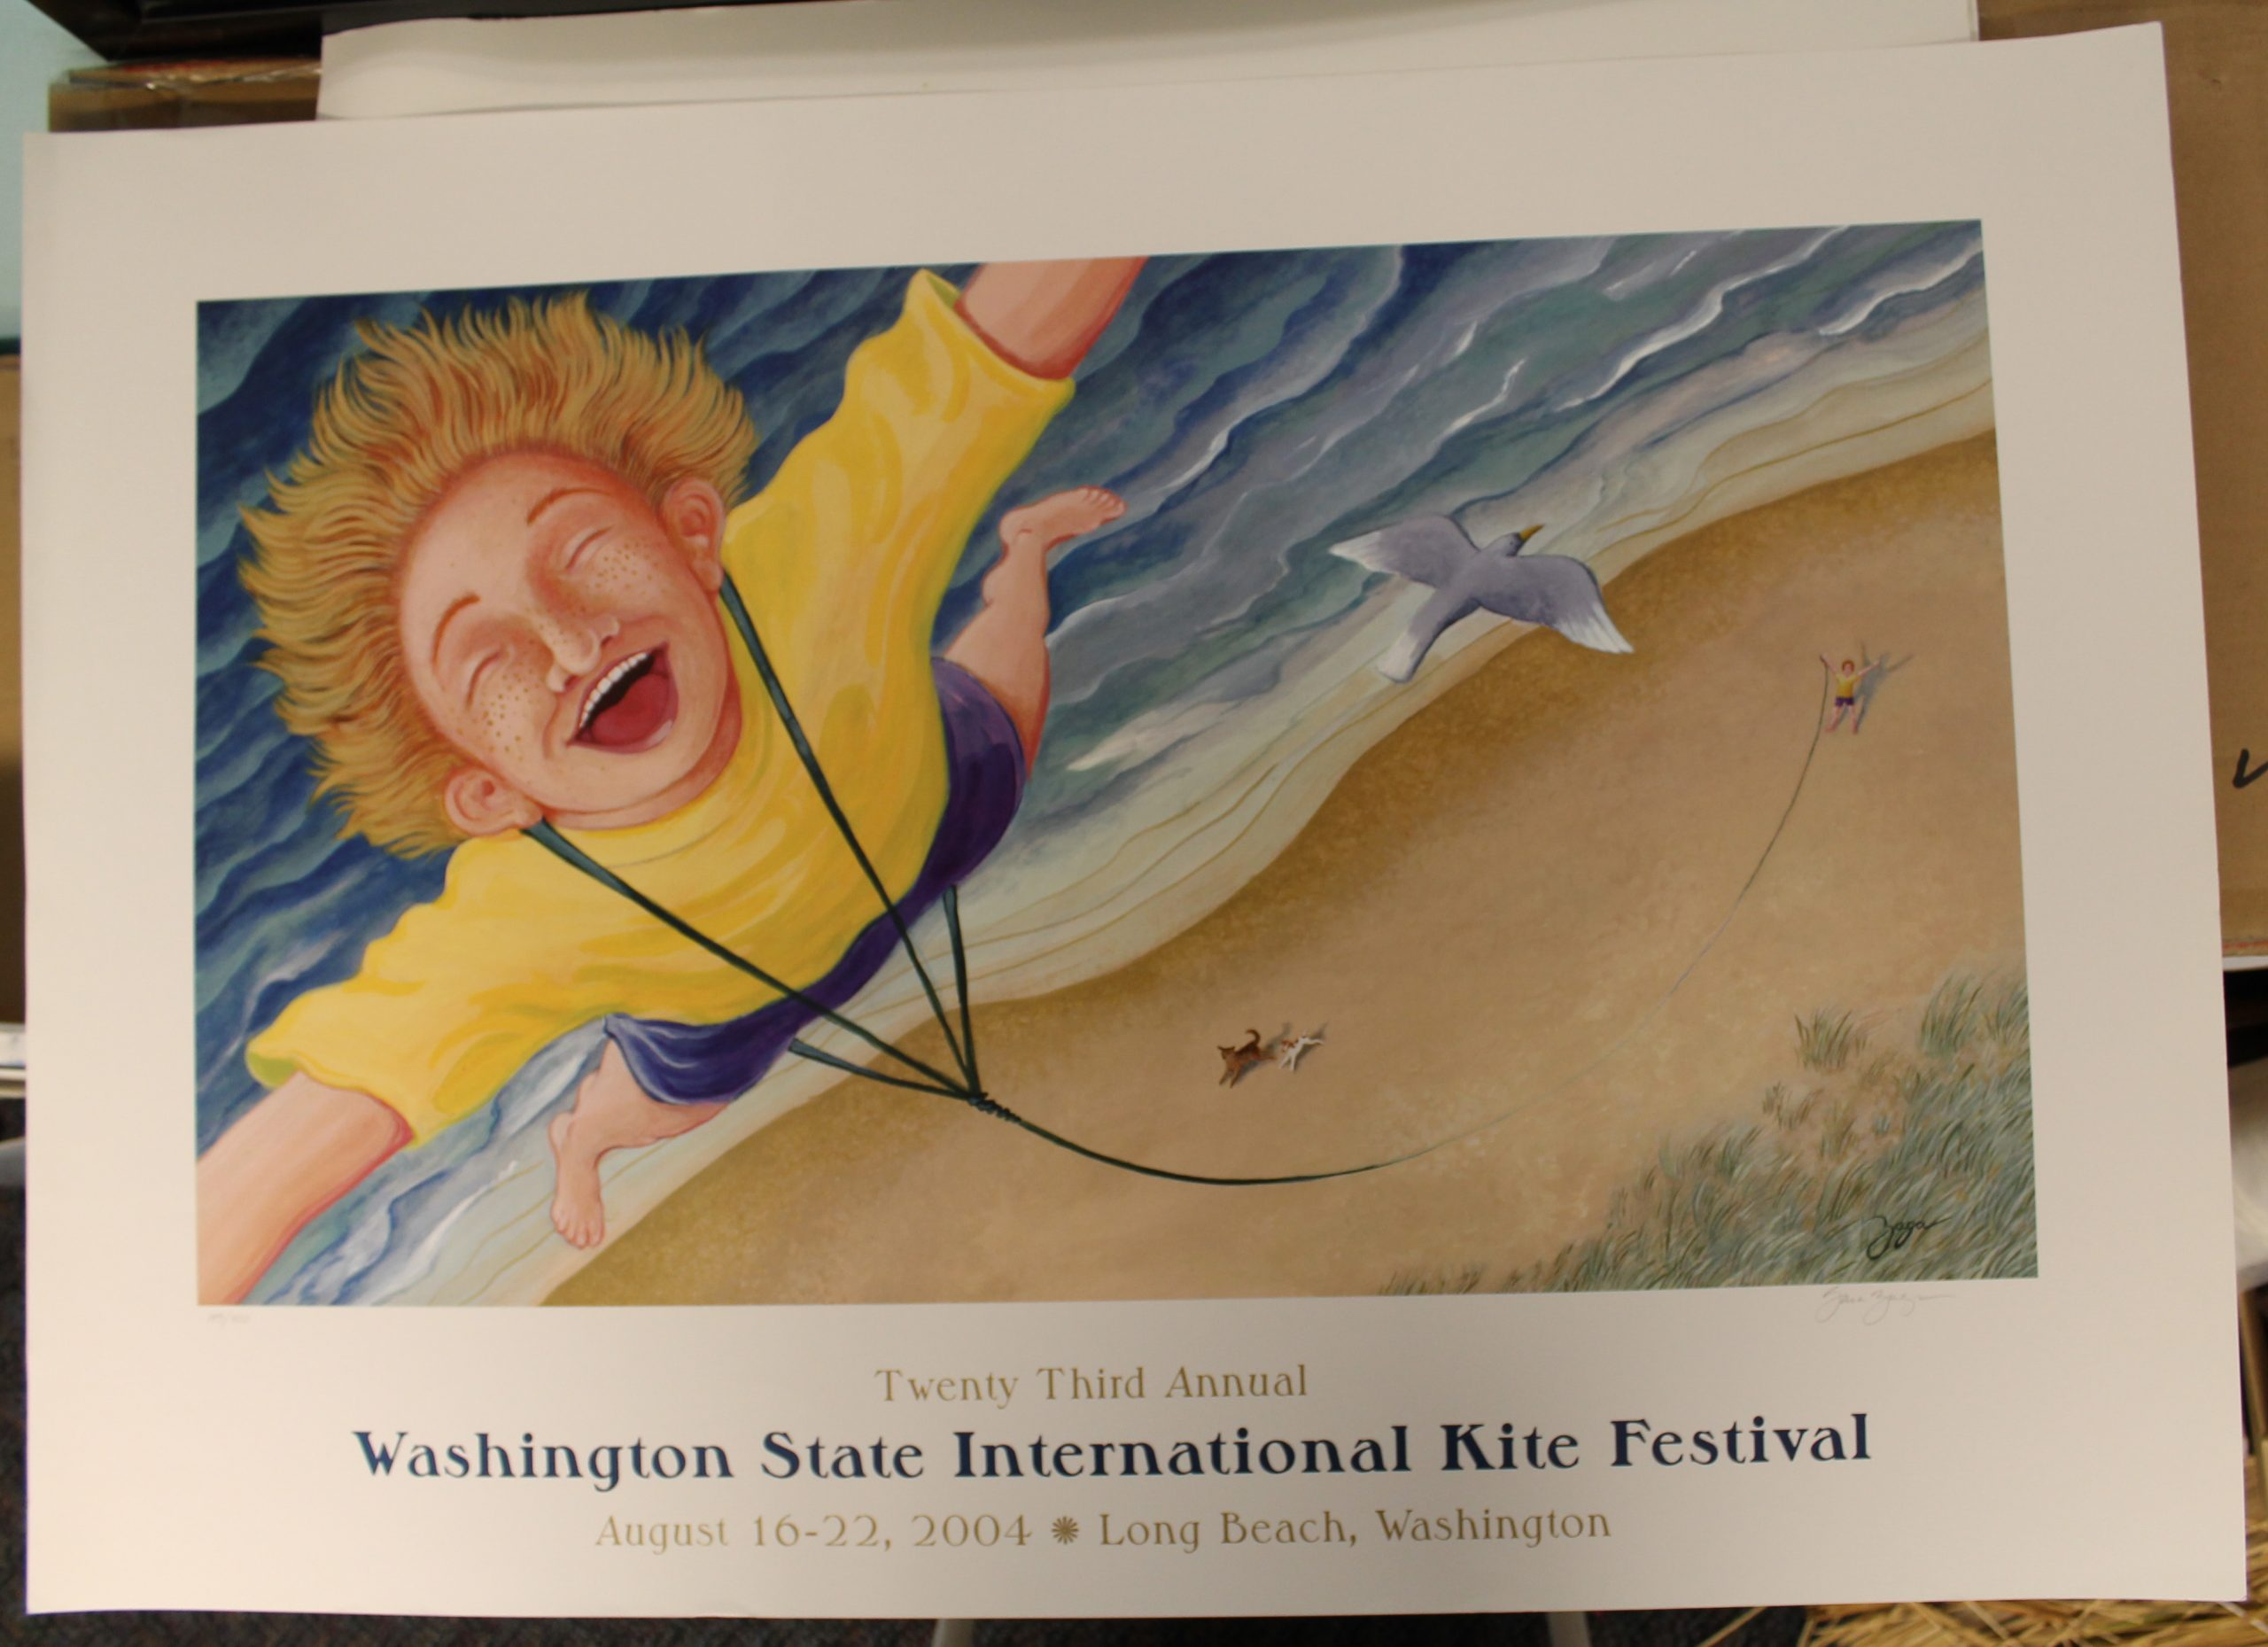 Kite Festival Poster Contest – World Kite Museum Regarding Long Beach Washington Events 2021